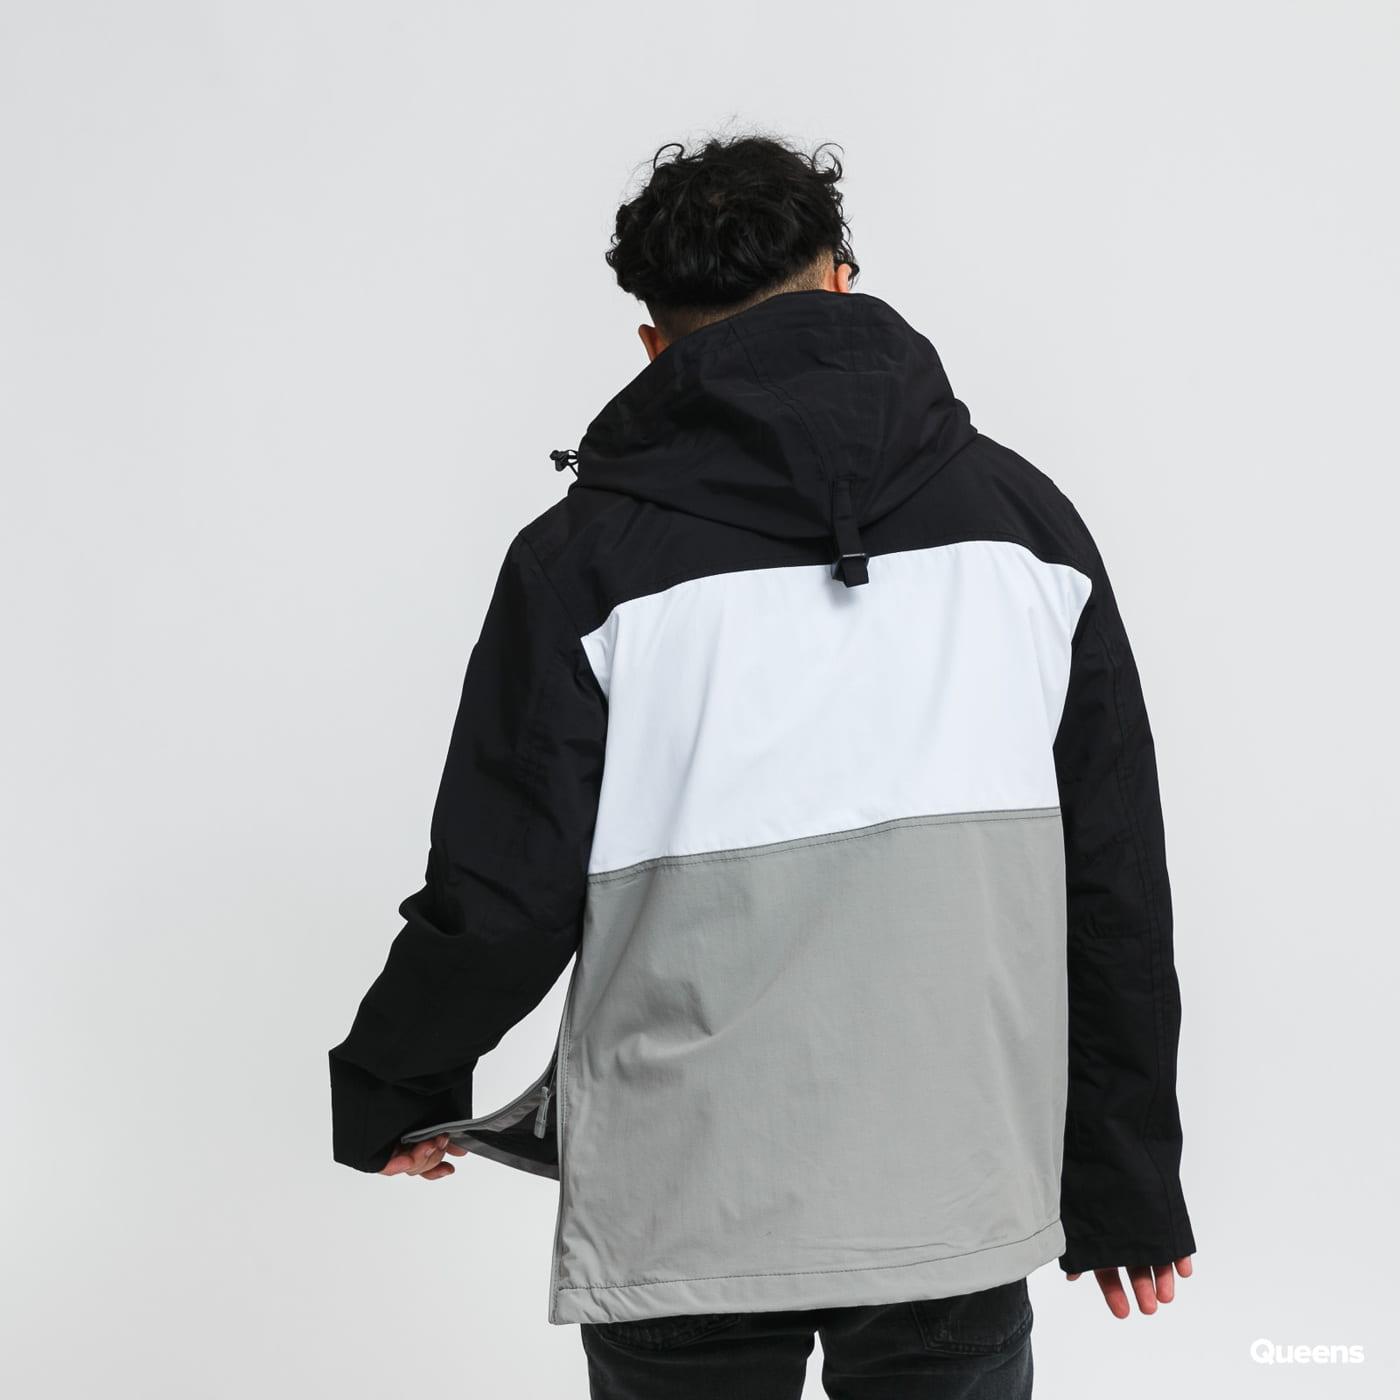 NAPAPIJRI Rainforest S Block 1 Jacket black / grey / white